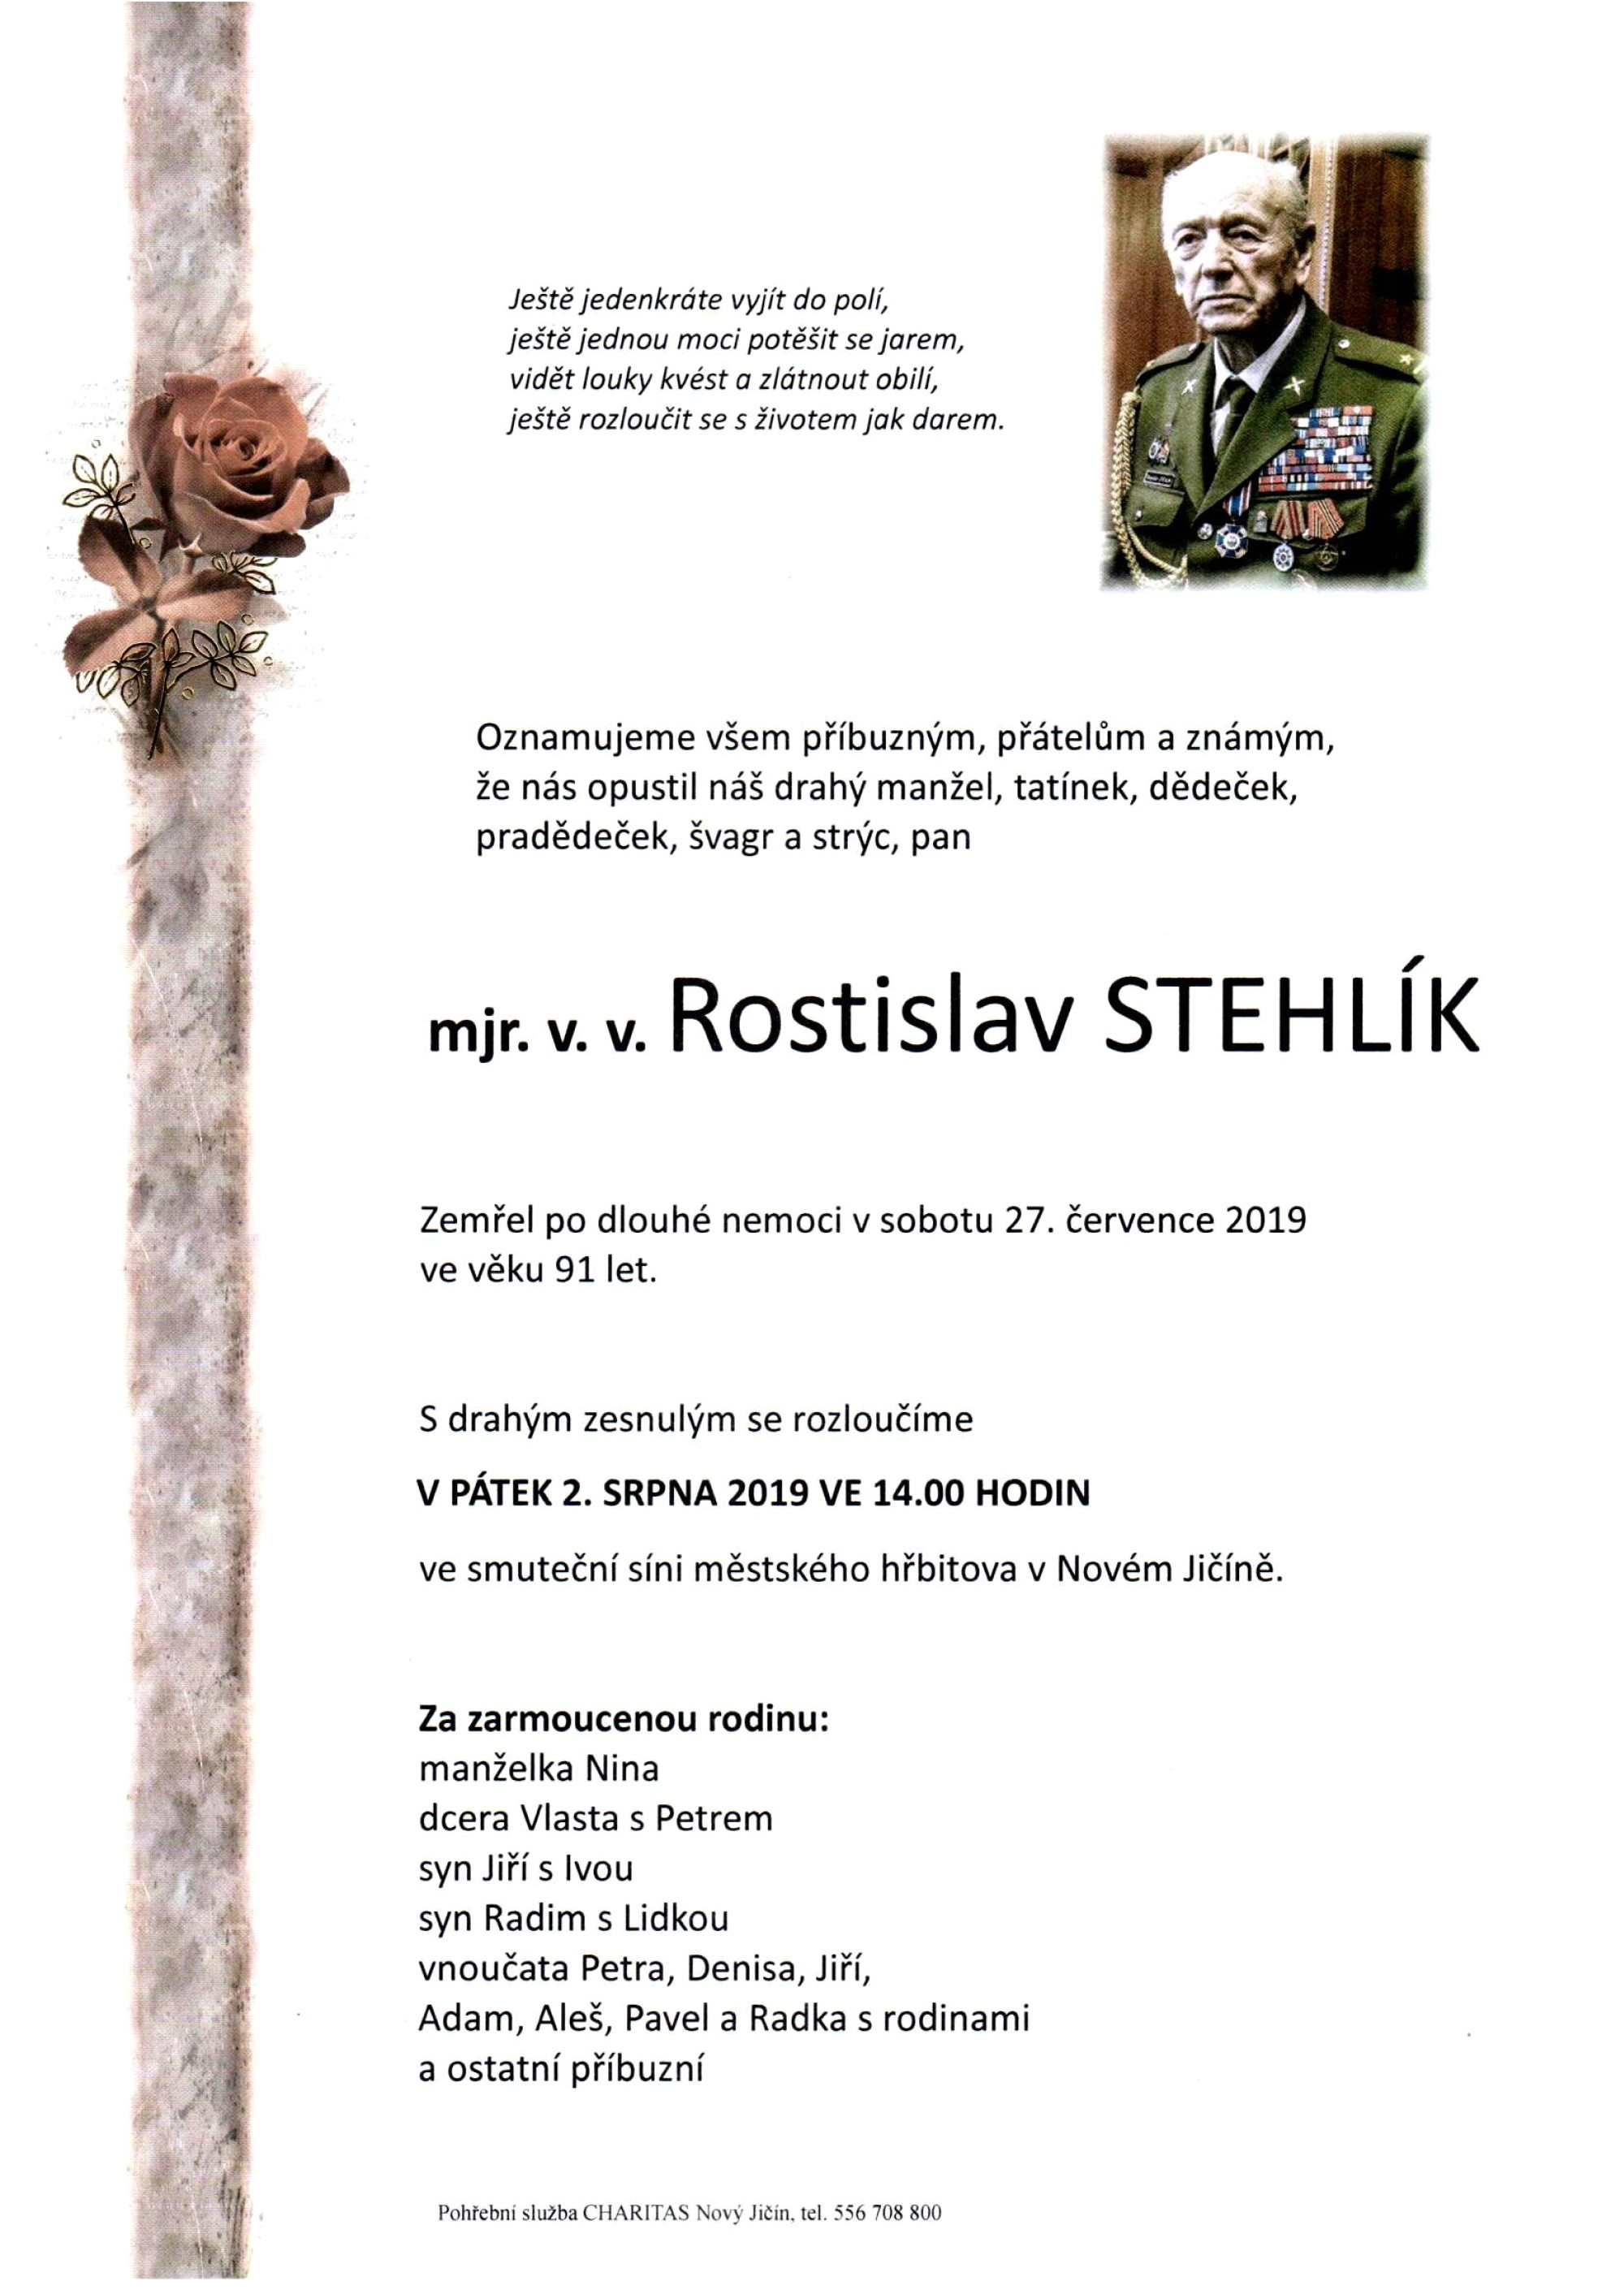 mjr. v. v. Rostislav Stehlík